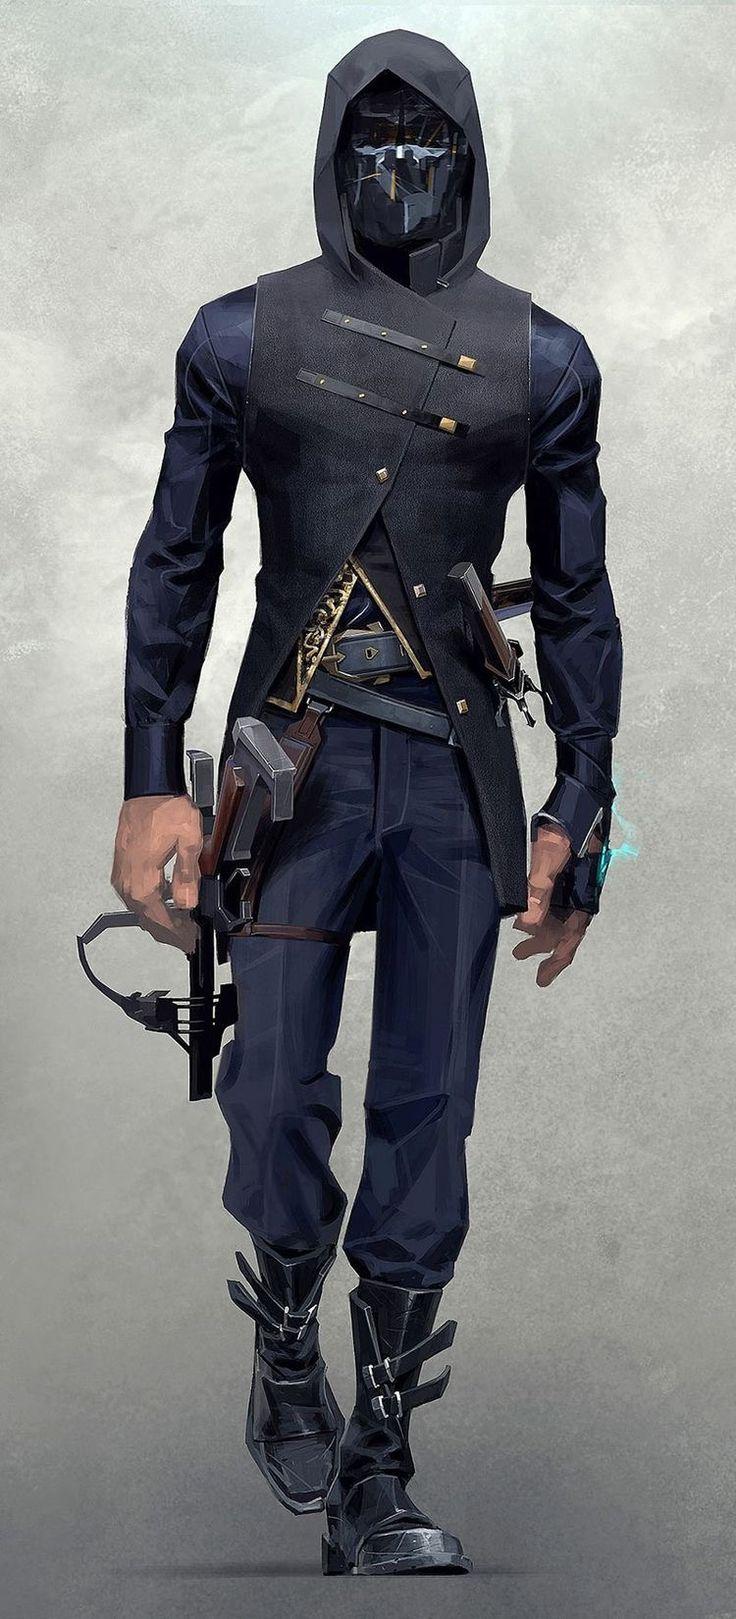 Bebi tatu kozelrol 526 - Call Of Duty